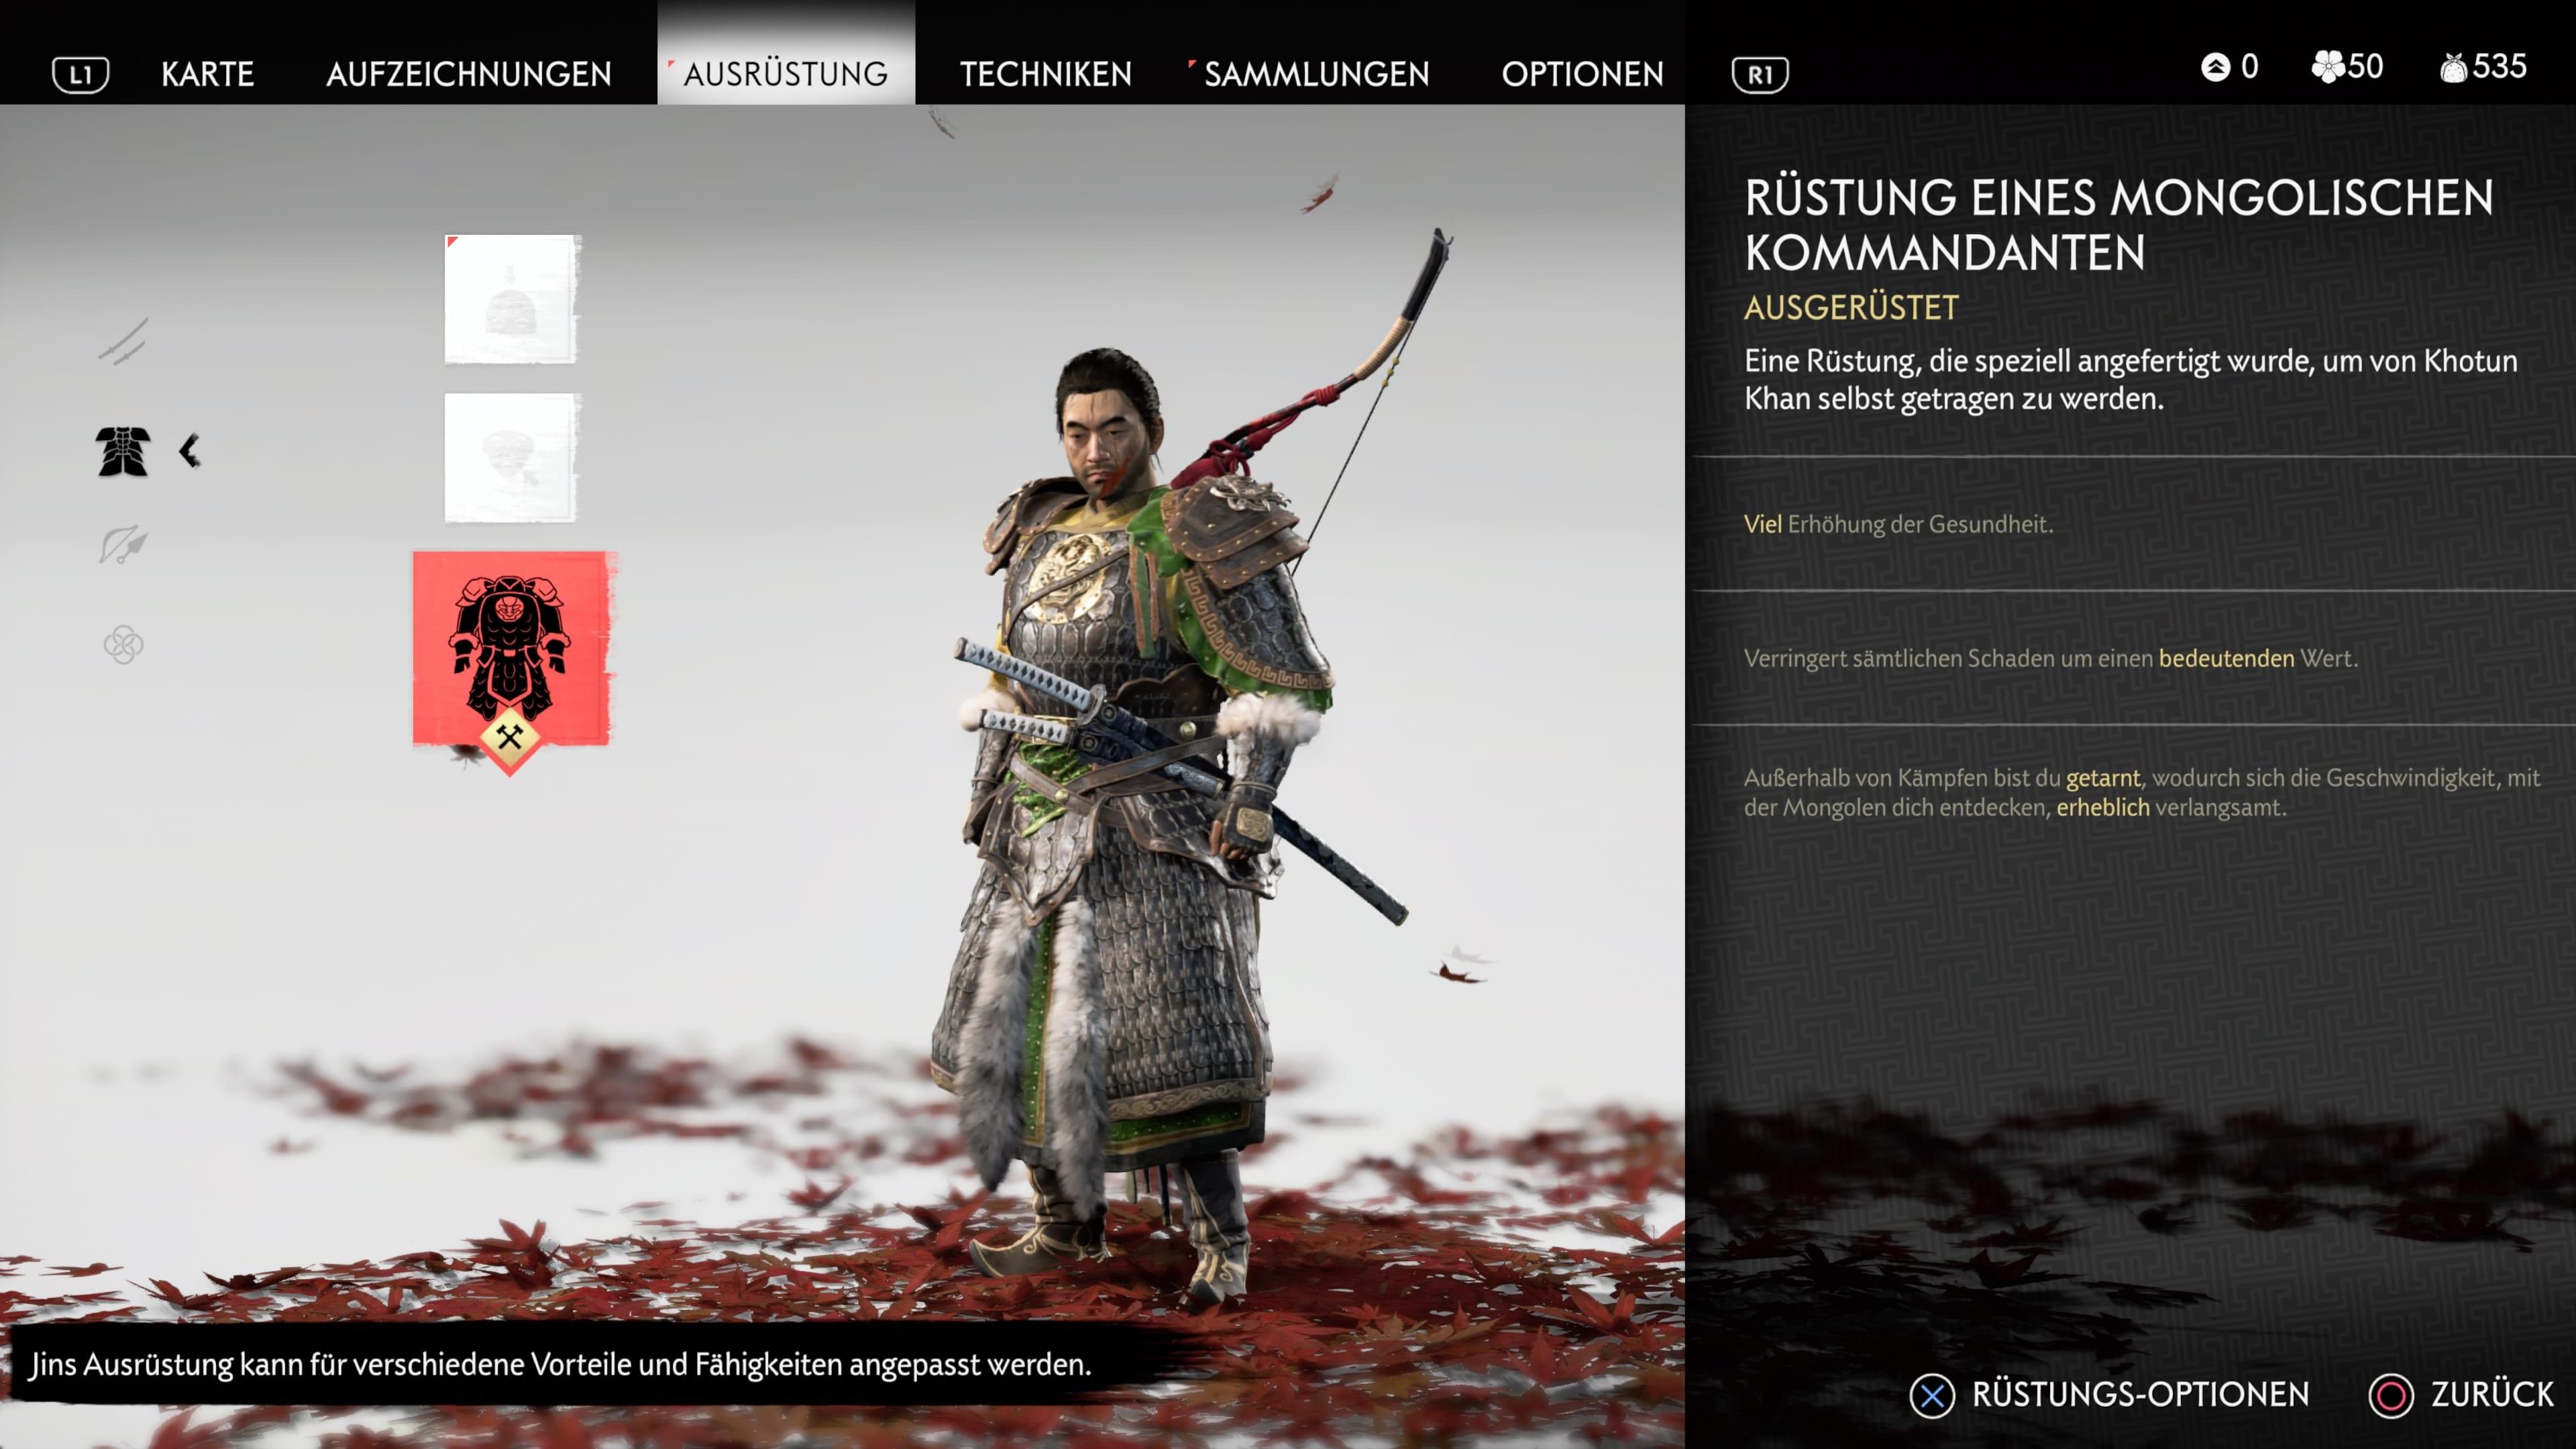 Ghost of Tsushima Rüstung mongolischer Kommandant